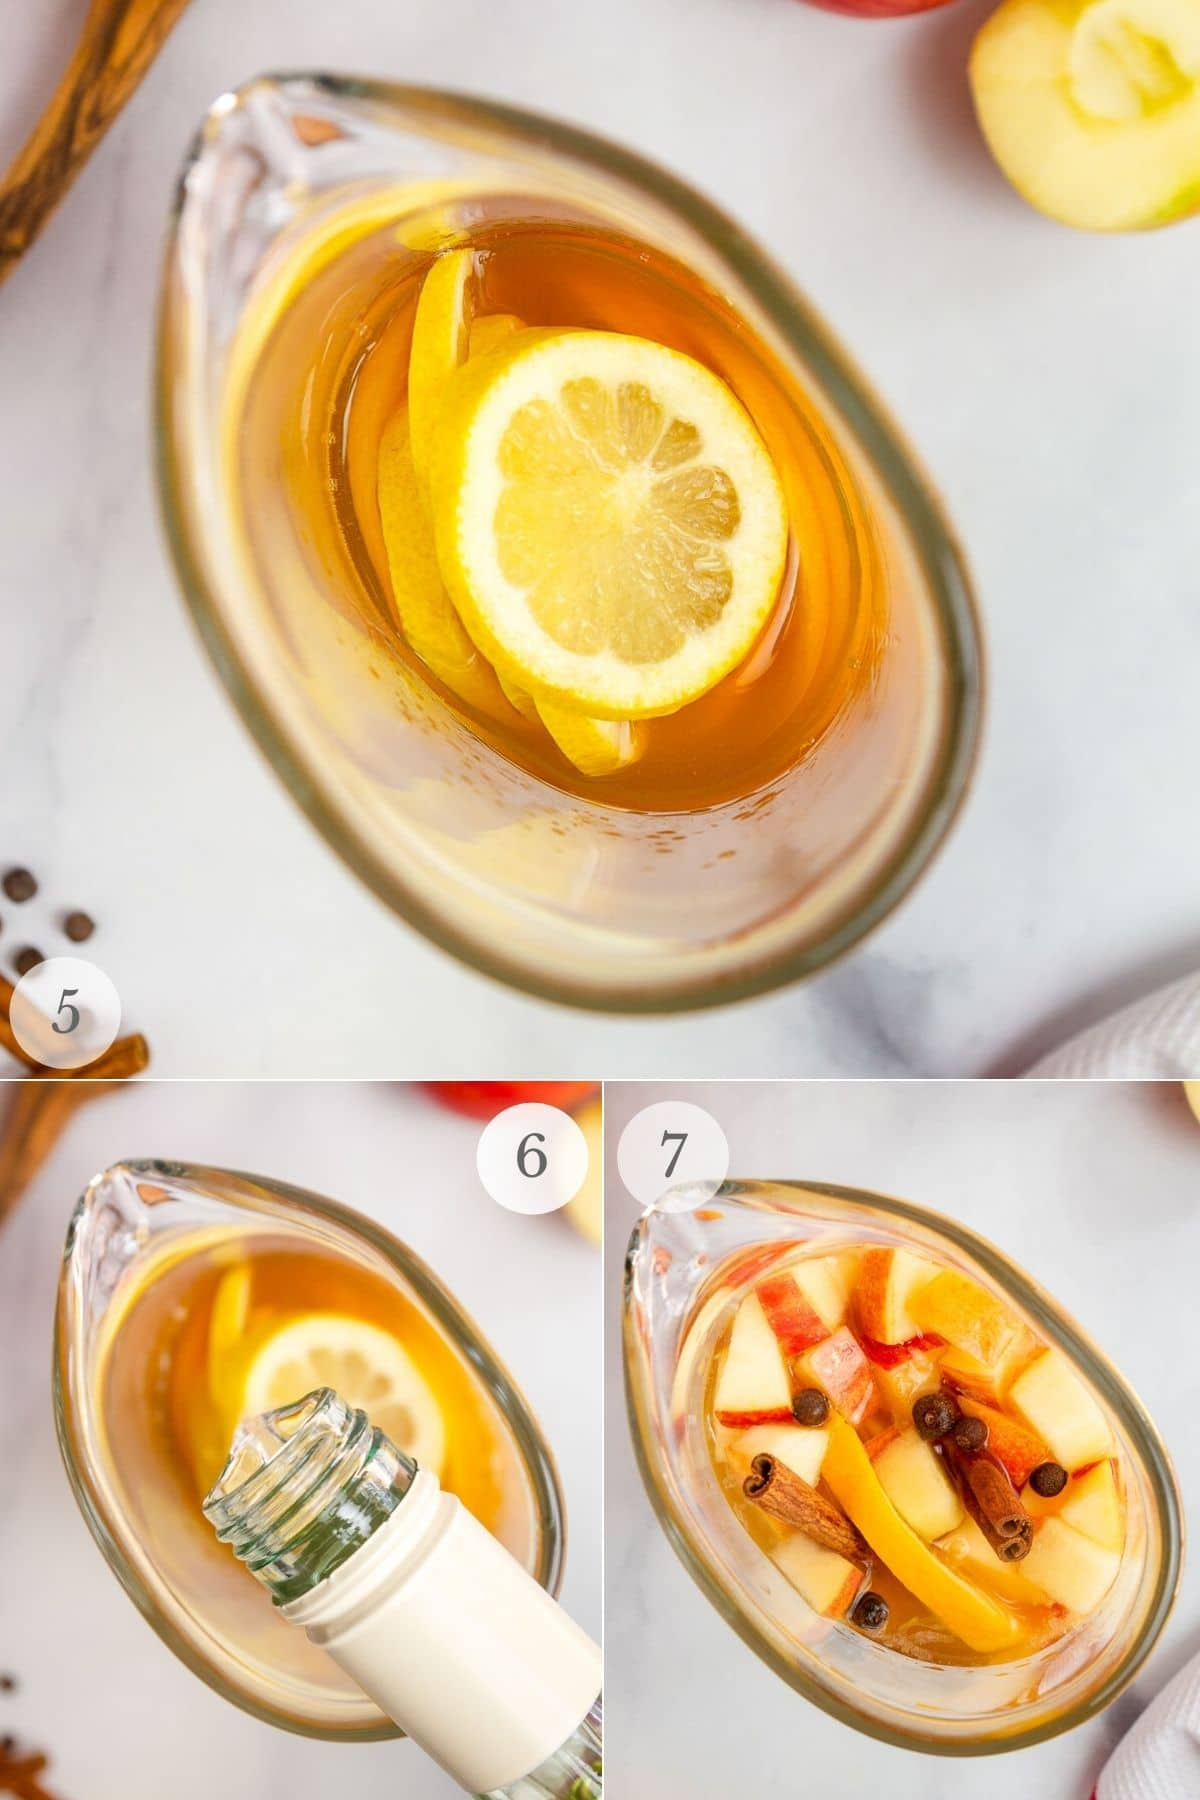 apple cider sangria recipe steps 5-7